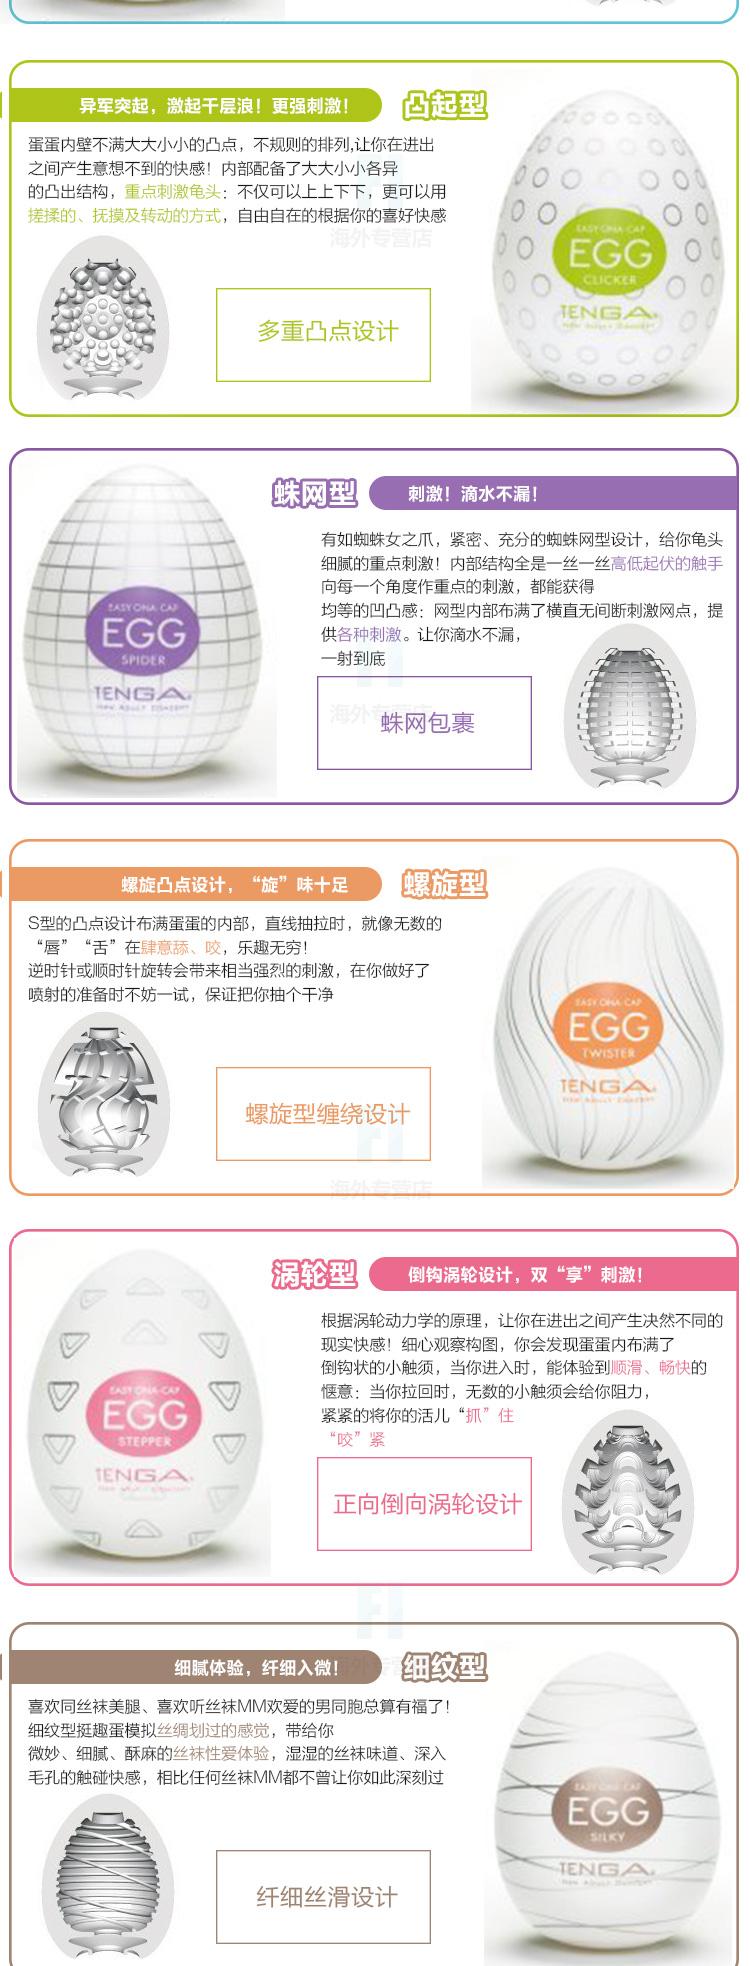 Tenga Egg 002 Clicker